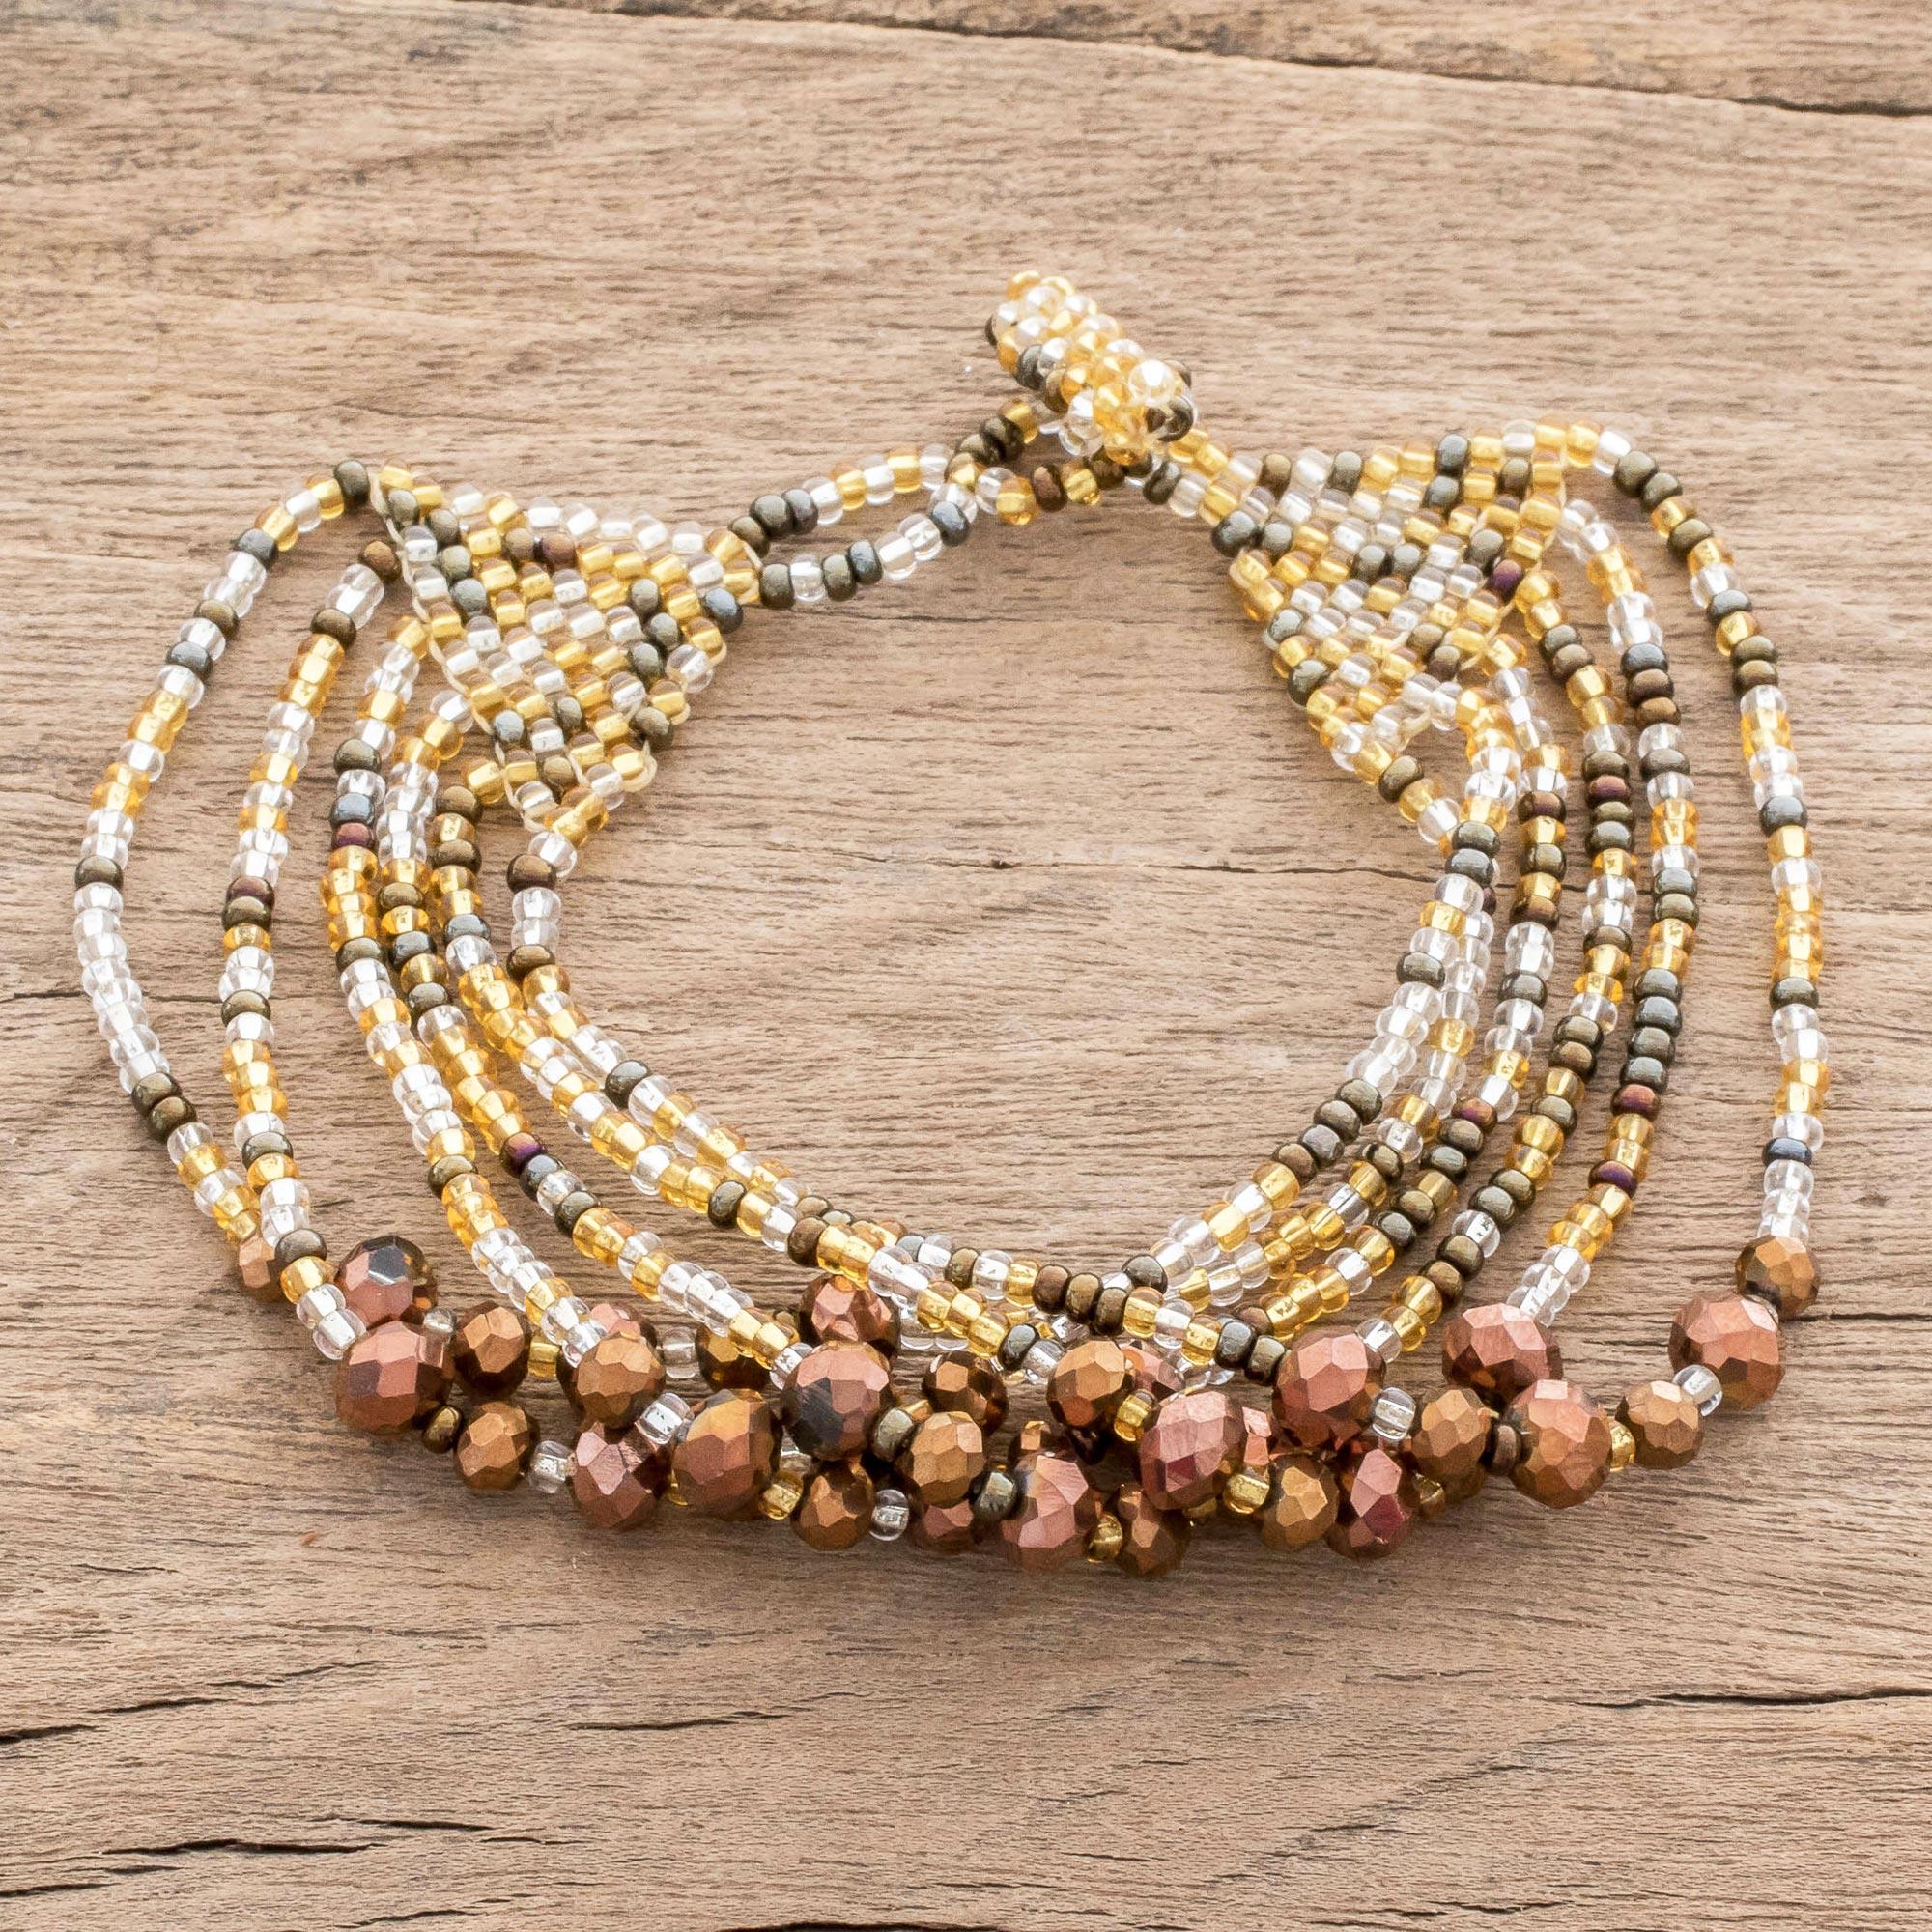 20 cm Gorgeous Crystal Artisan Bead Strand